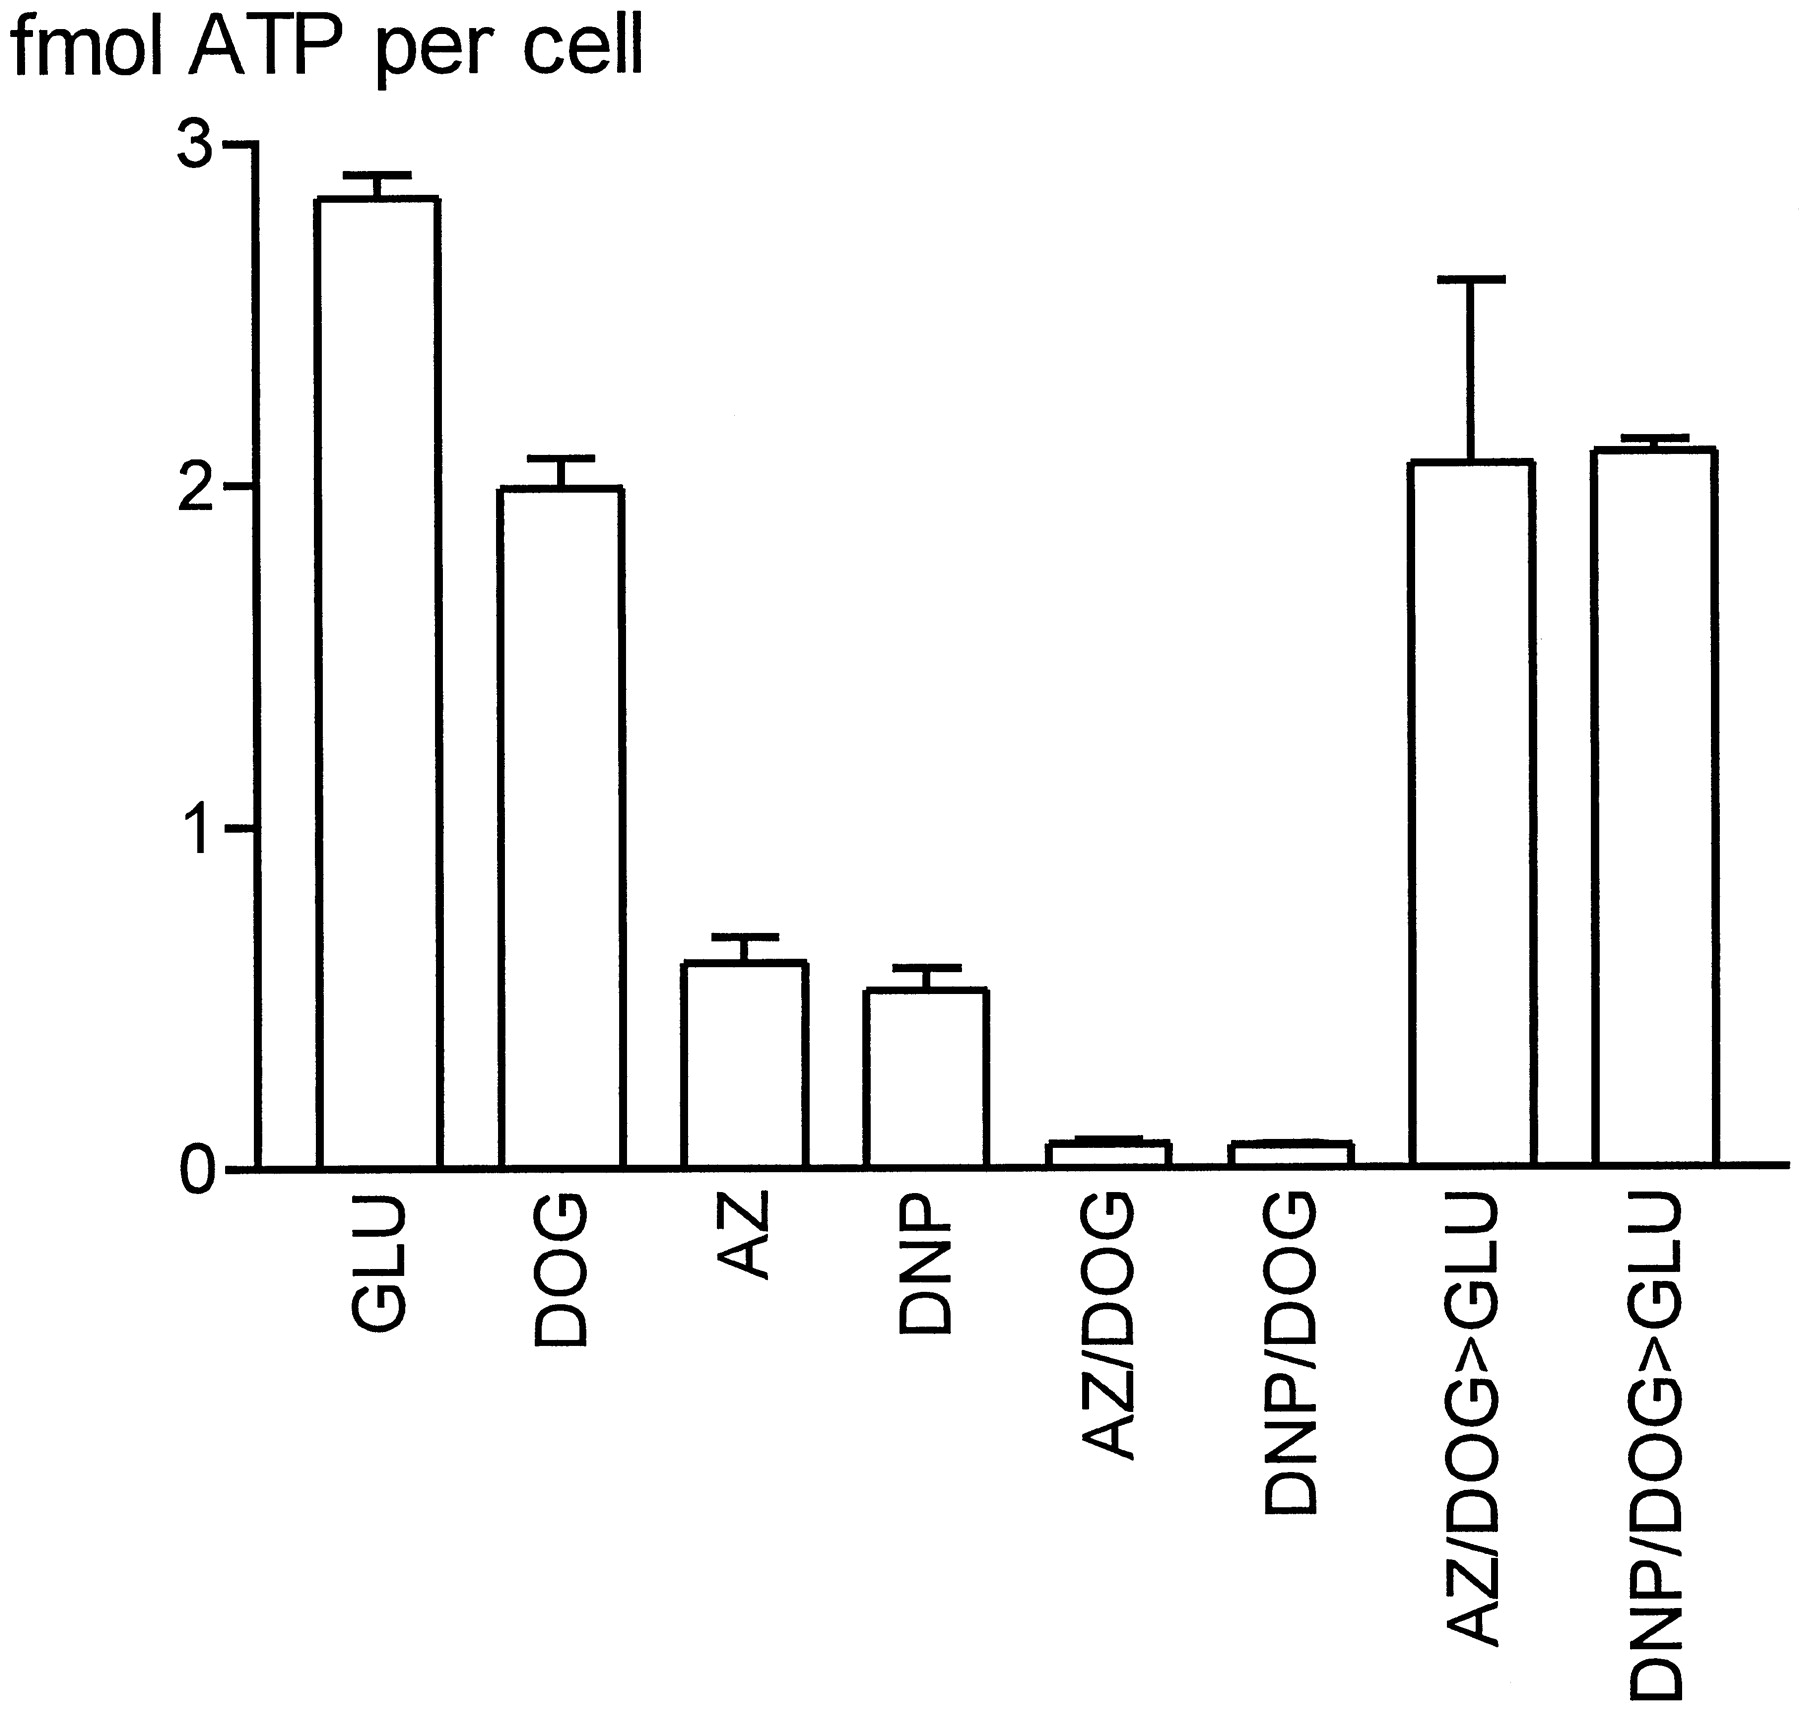 Effect of Cellular ATP Depletion on Topoisomerase II Poisons